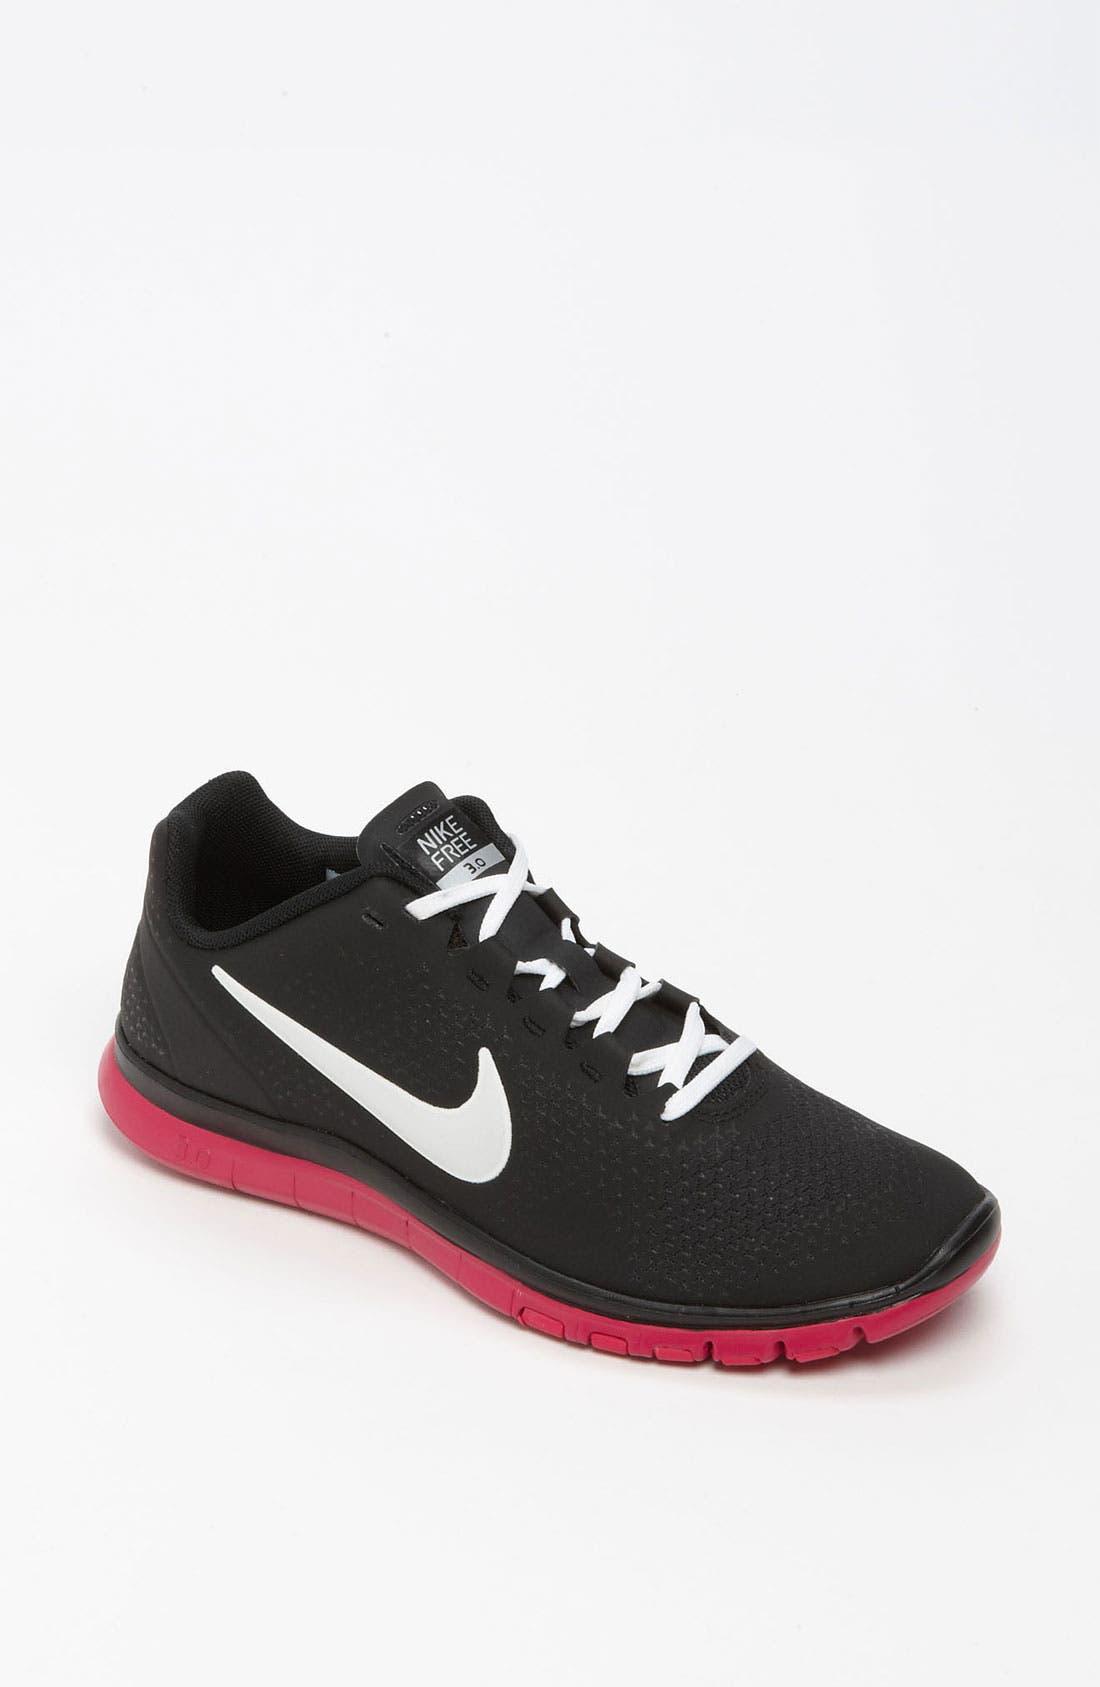 Alternate Image 1 Selected - Nike 'Free Advantage' Training Shoe (Women)